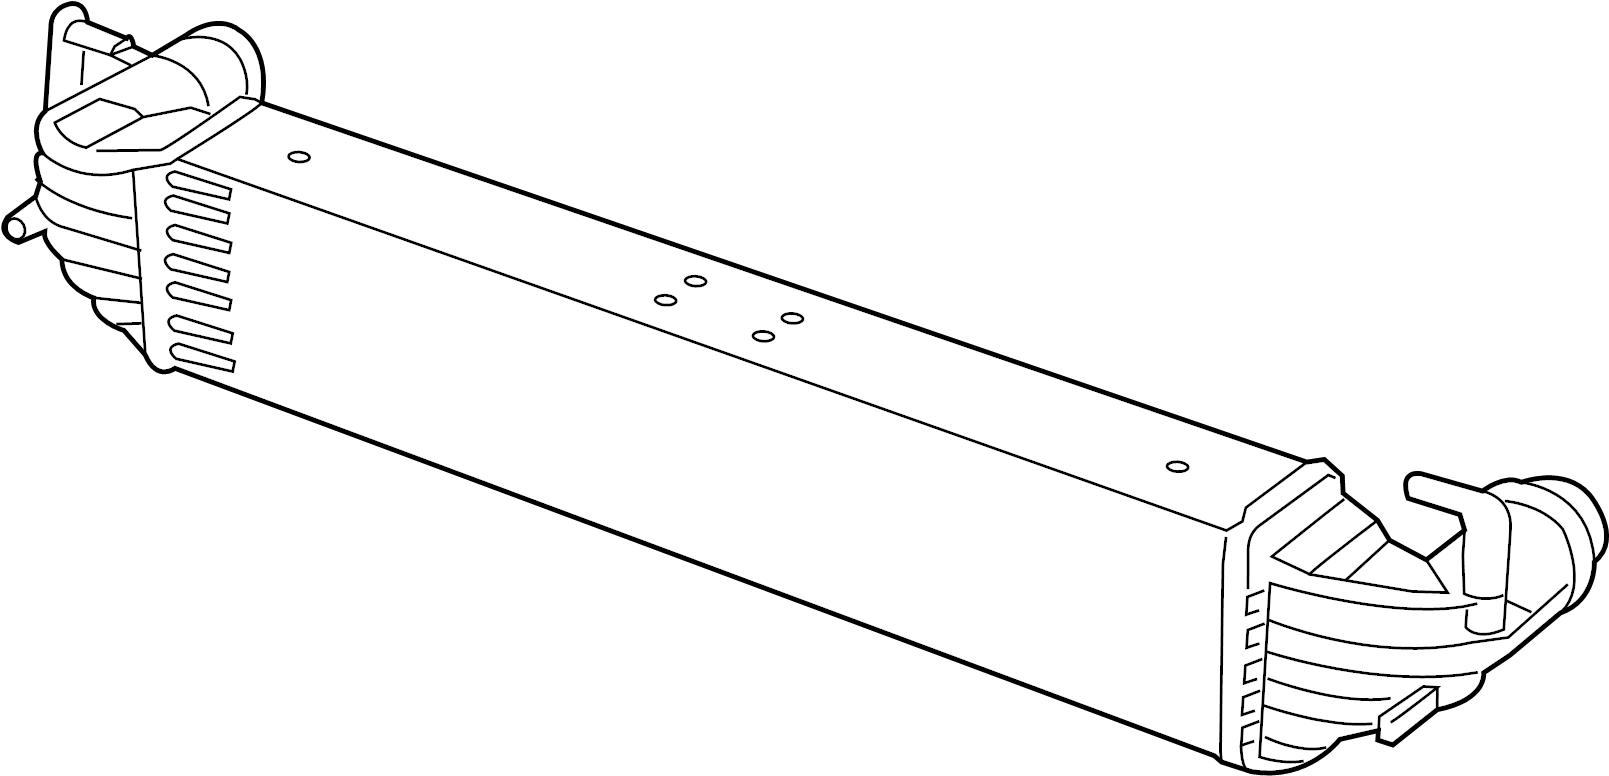 Audi S5 Intercooler